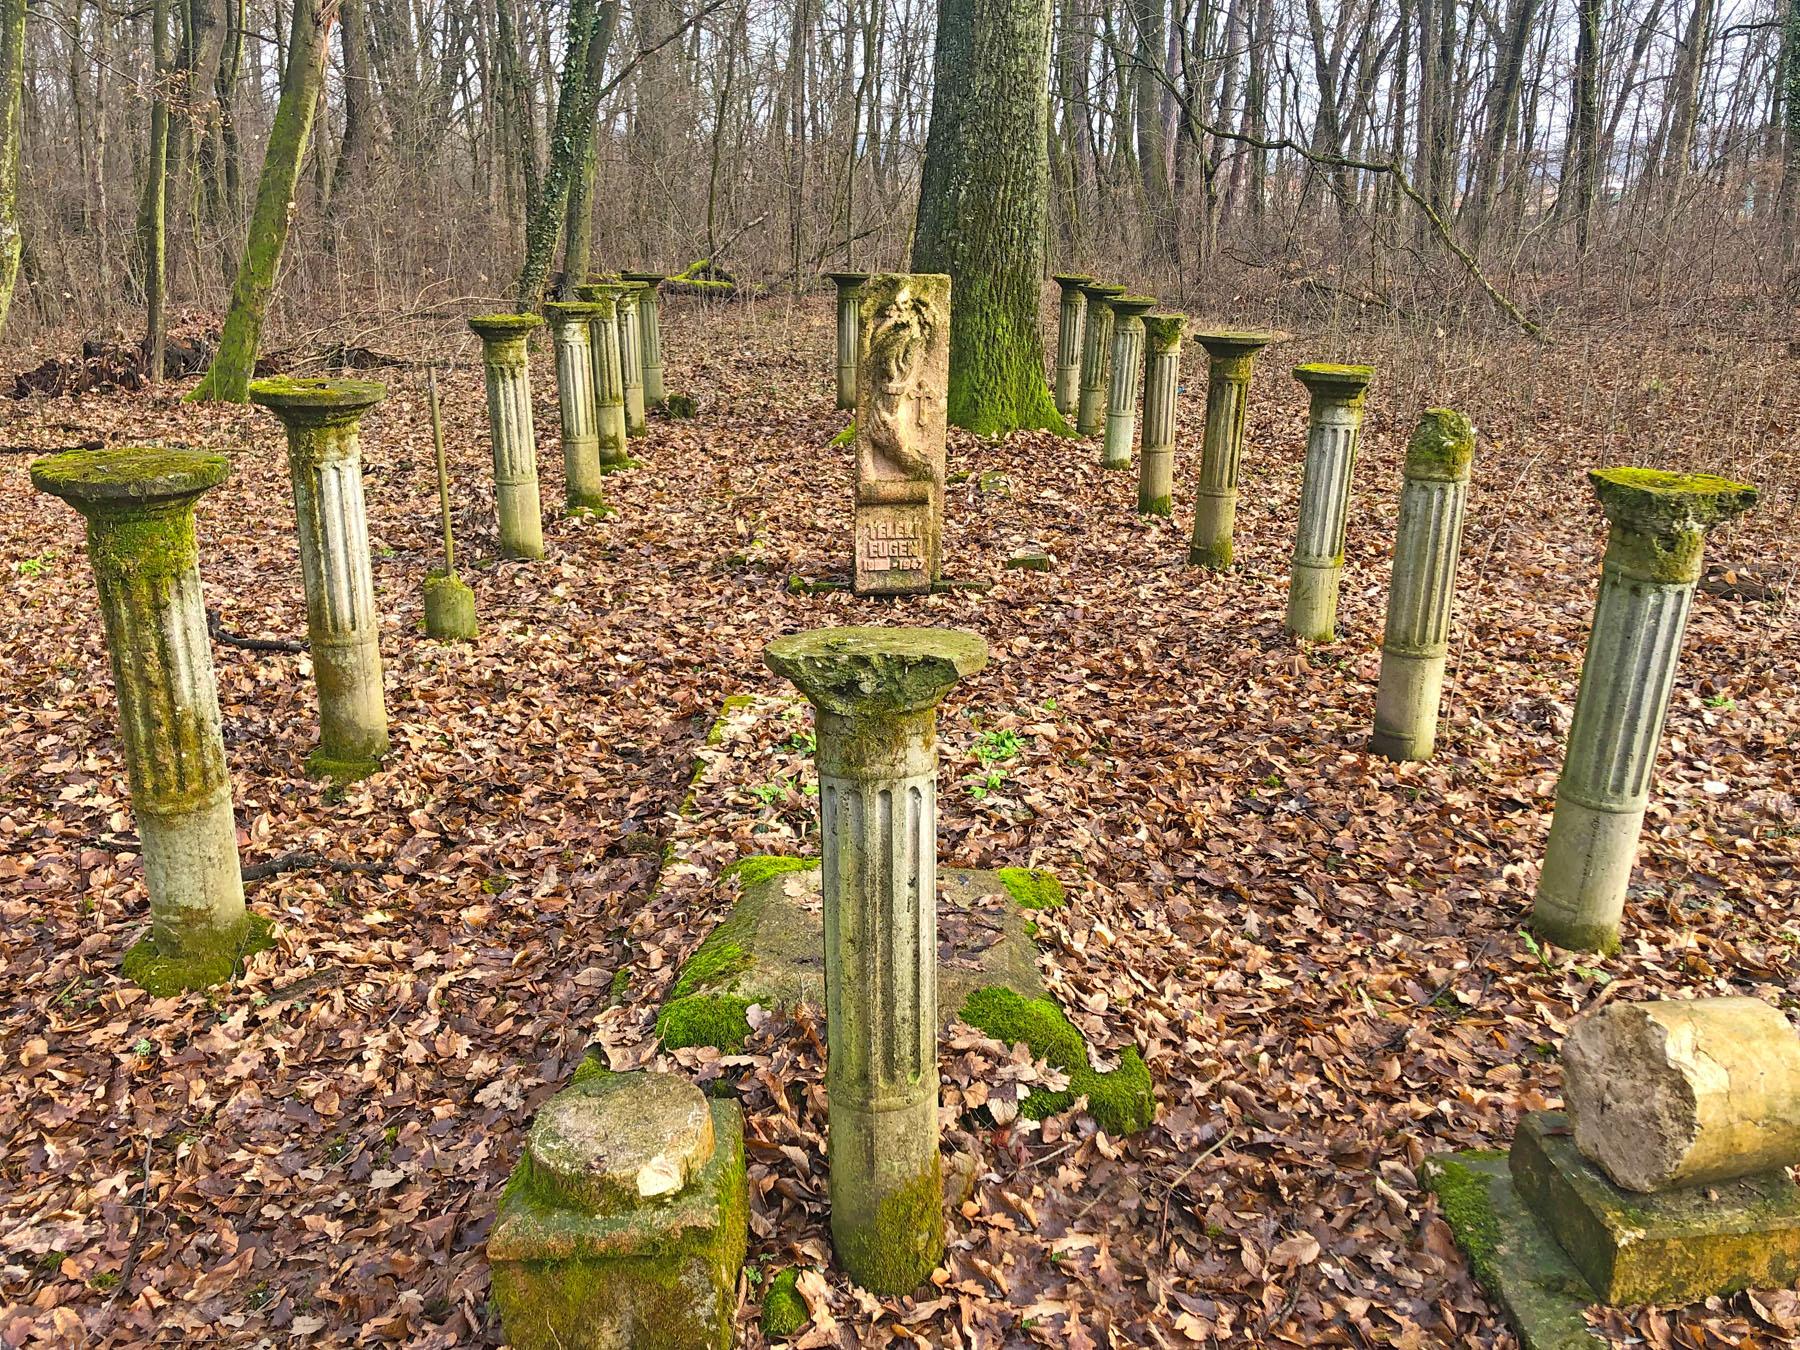 https://ahe-ro.s3.amazonaws.com/8891/cimitir-palatul-mocioni-teleki-capalnas-%281%29.jpg